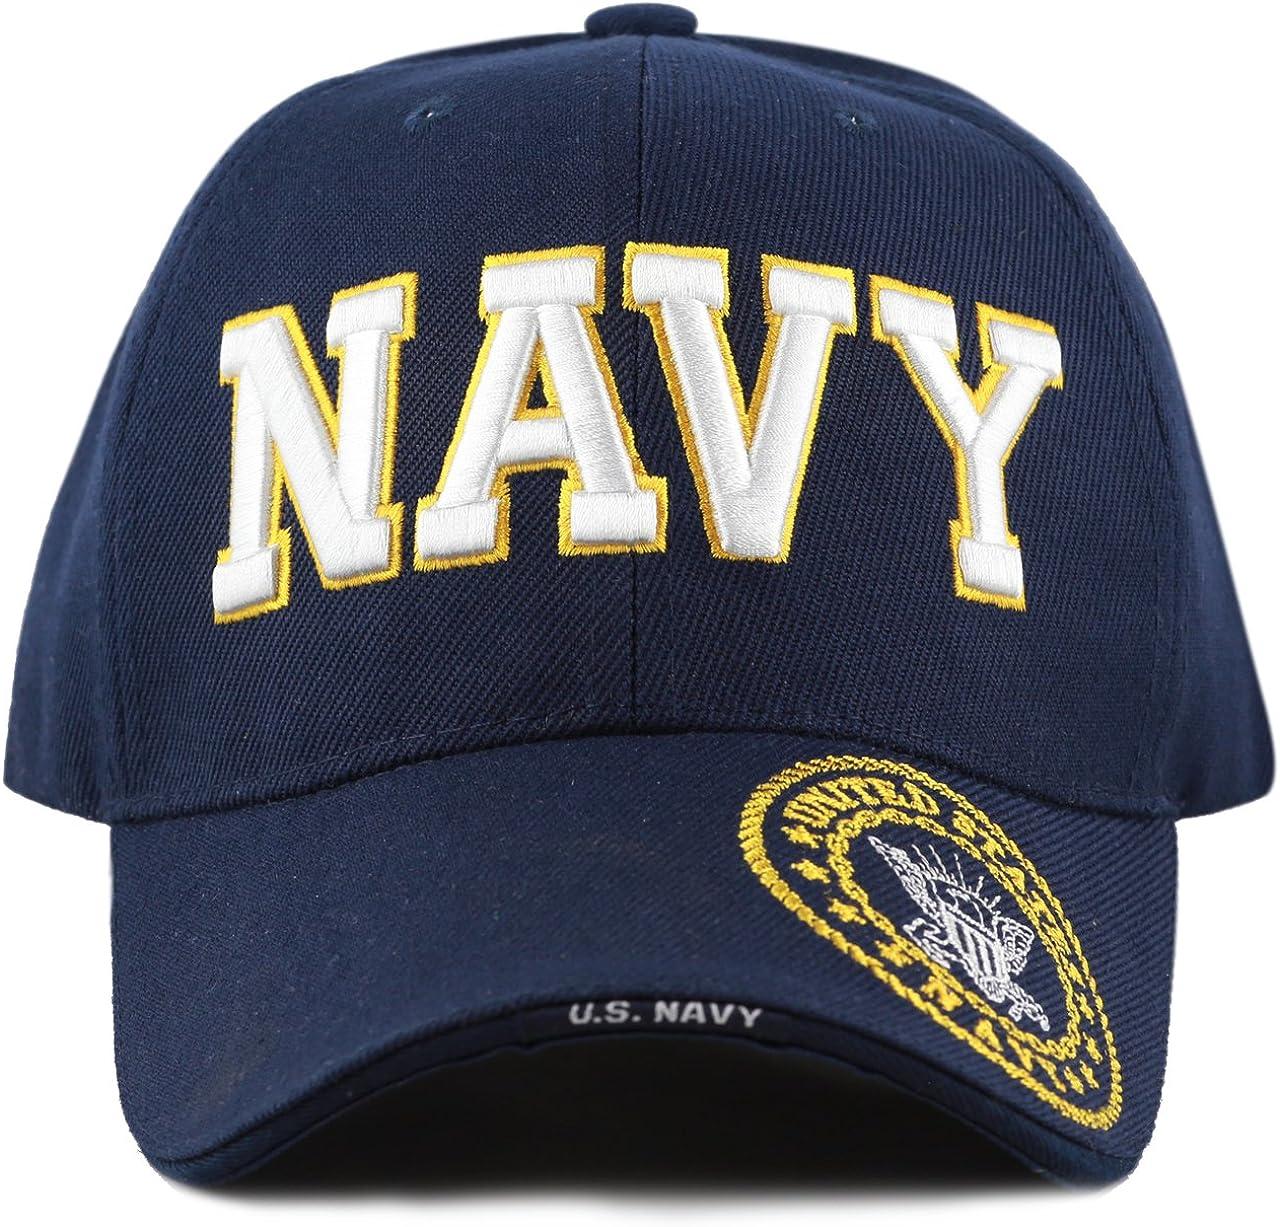 Buy Caps Chicago Mall and Hats U.S. Navy O Mens High quality new Military Cap Baseball Veteran